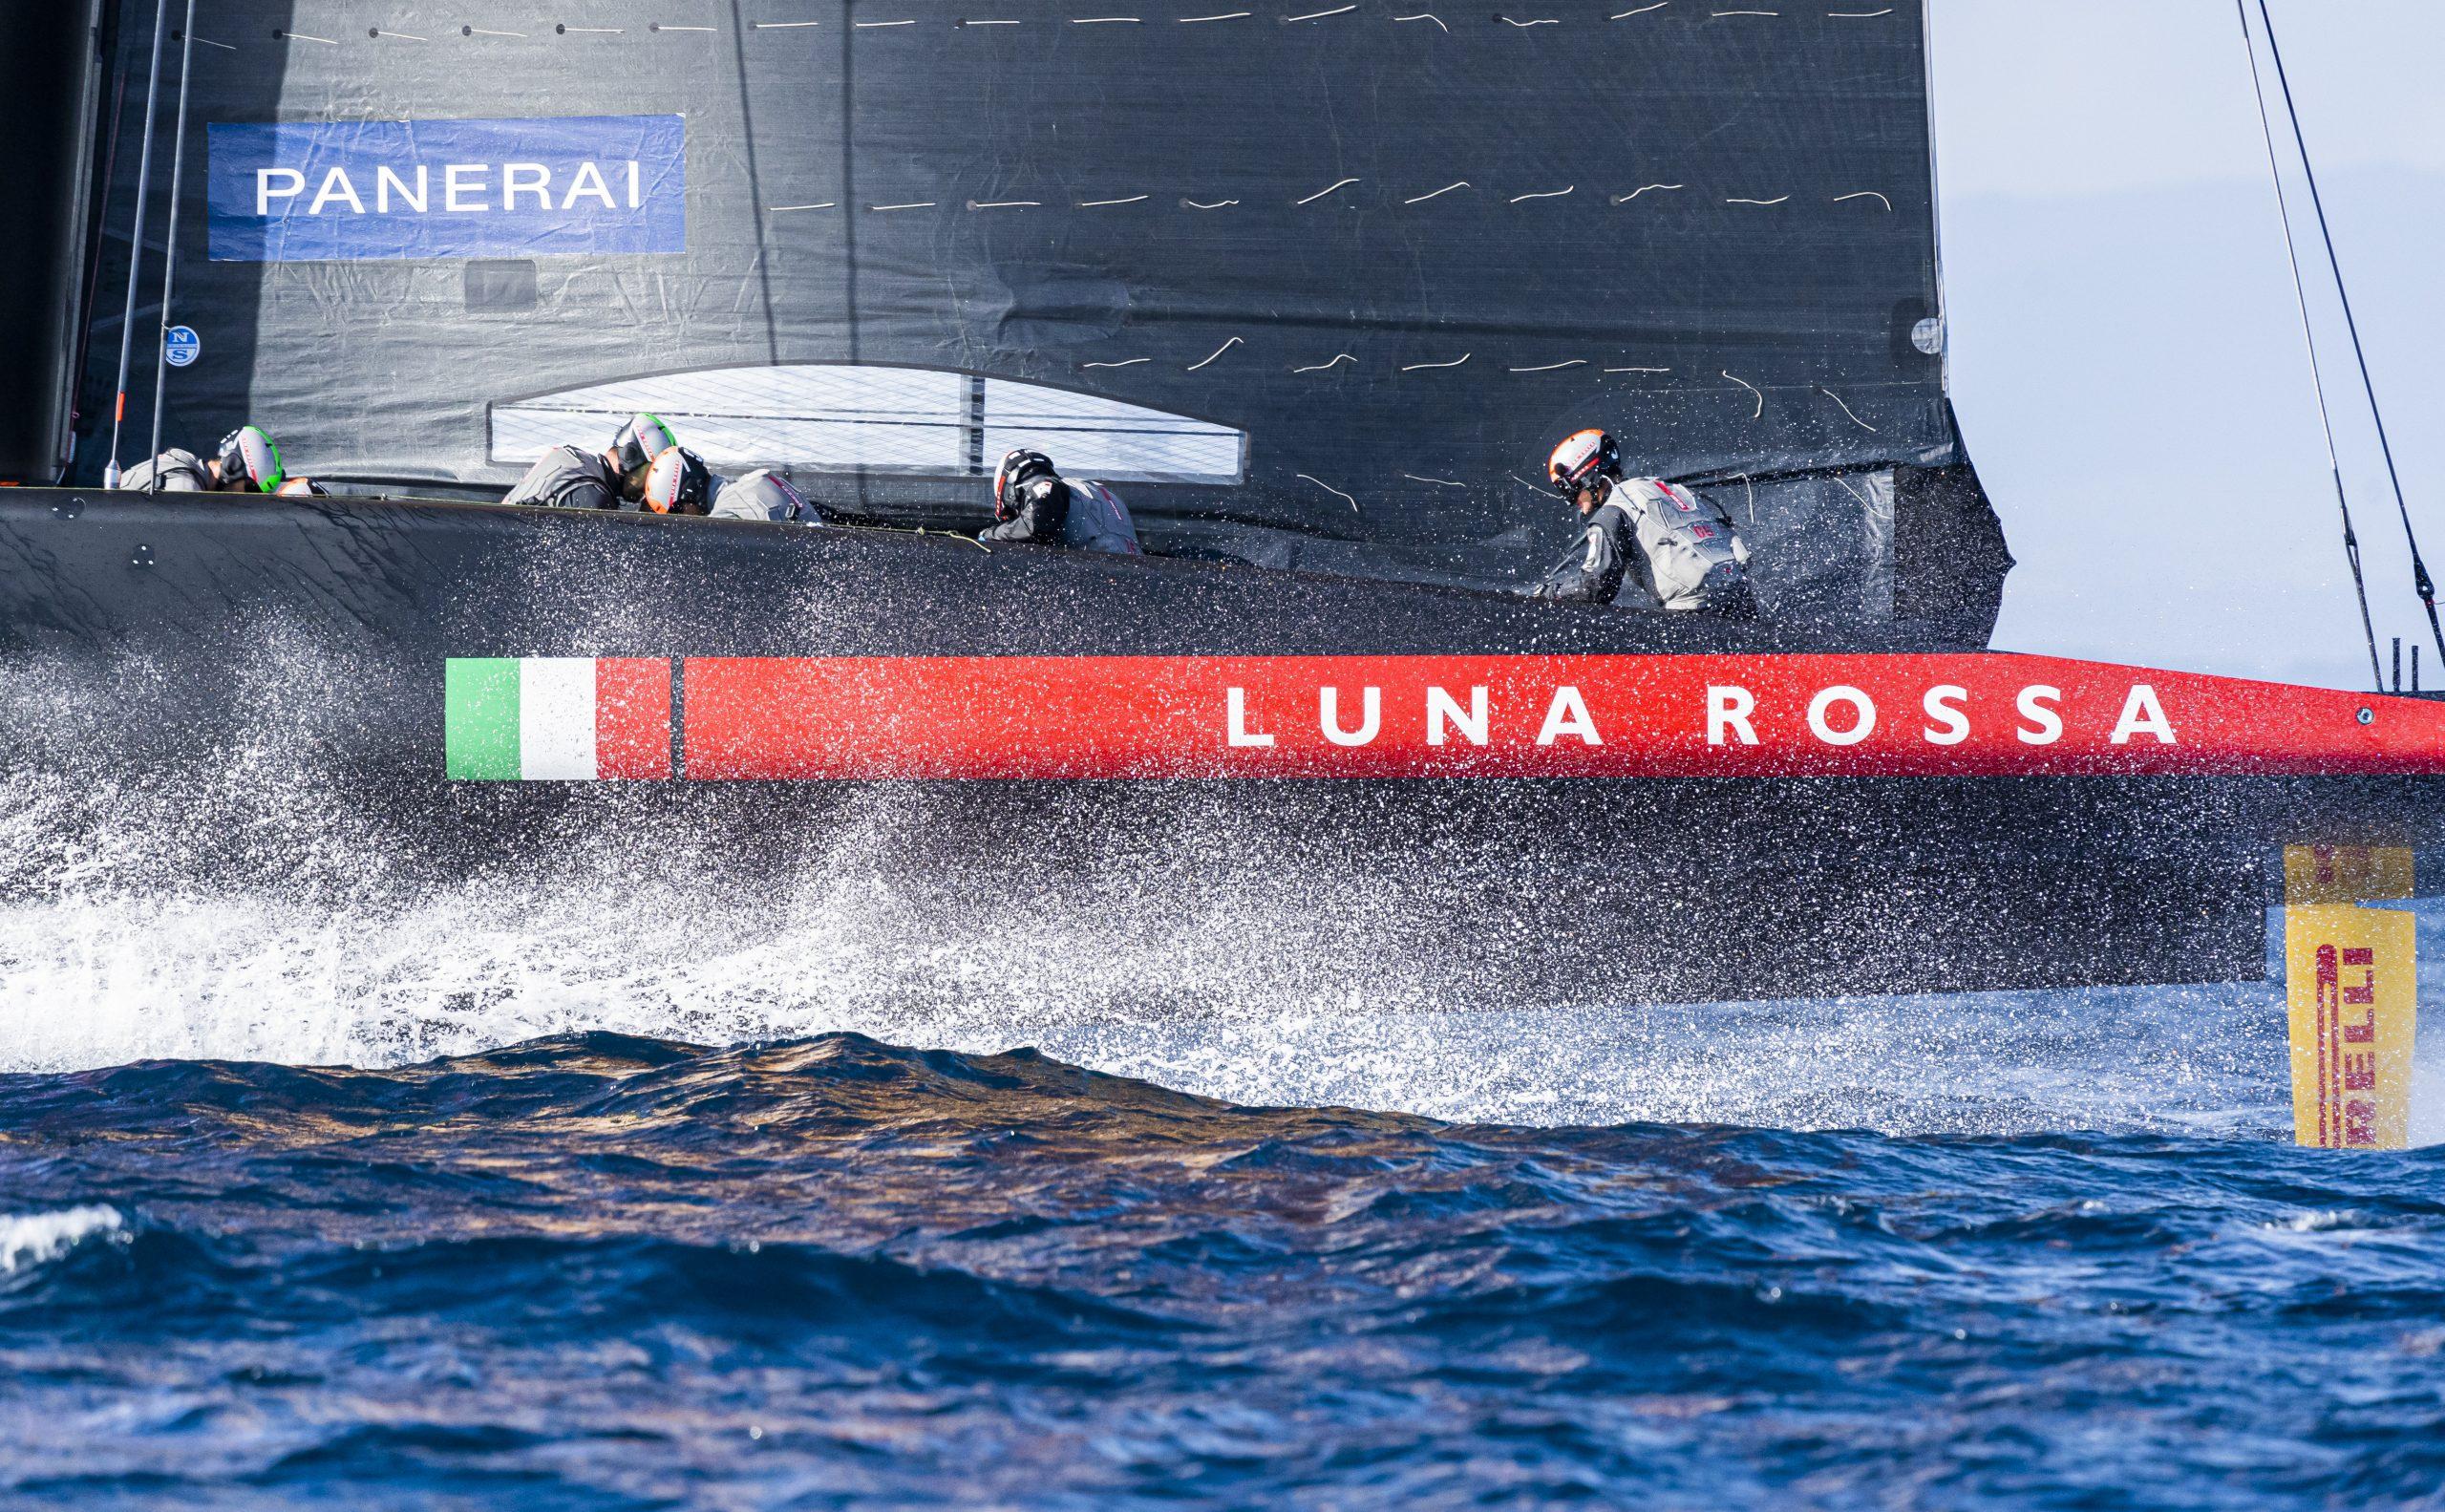 America's Cup: Luna Rossa repart en mer